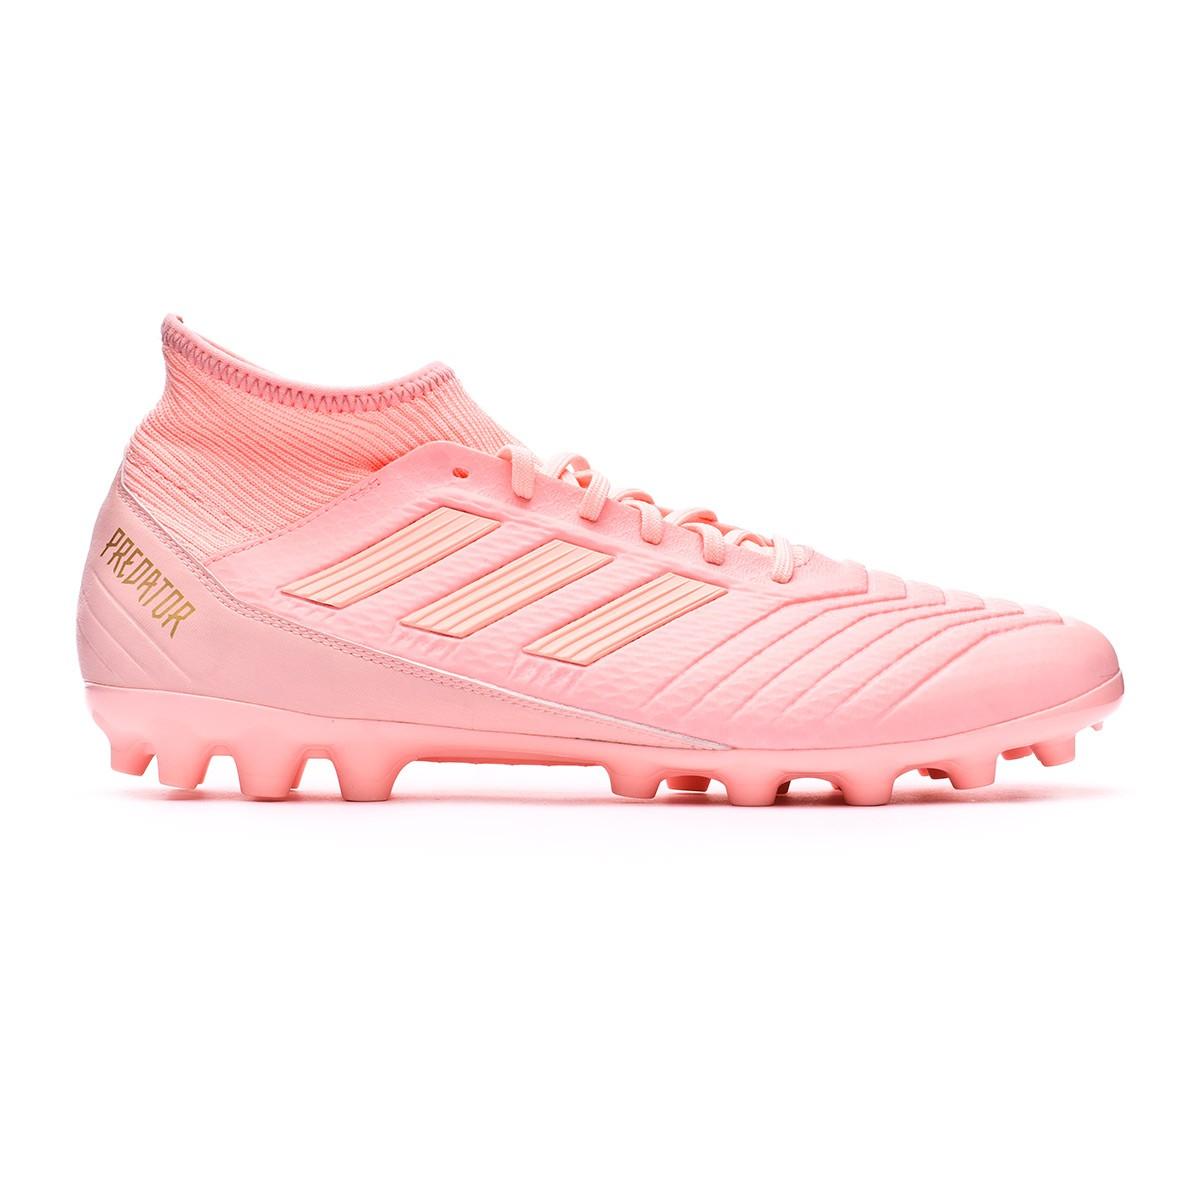 Aburrir En consecuencia espíritu  Football Boots adidas Predator 18.3 AG Clear orange-Trace pink - Football  store Fútbol Emotion